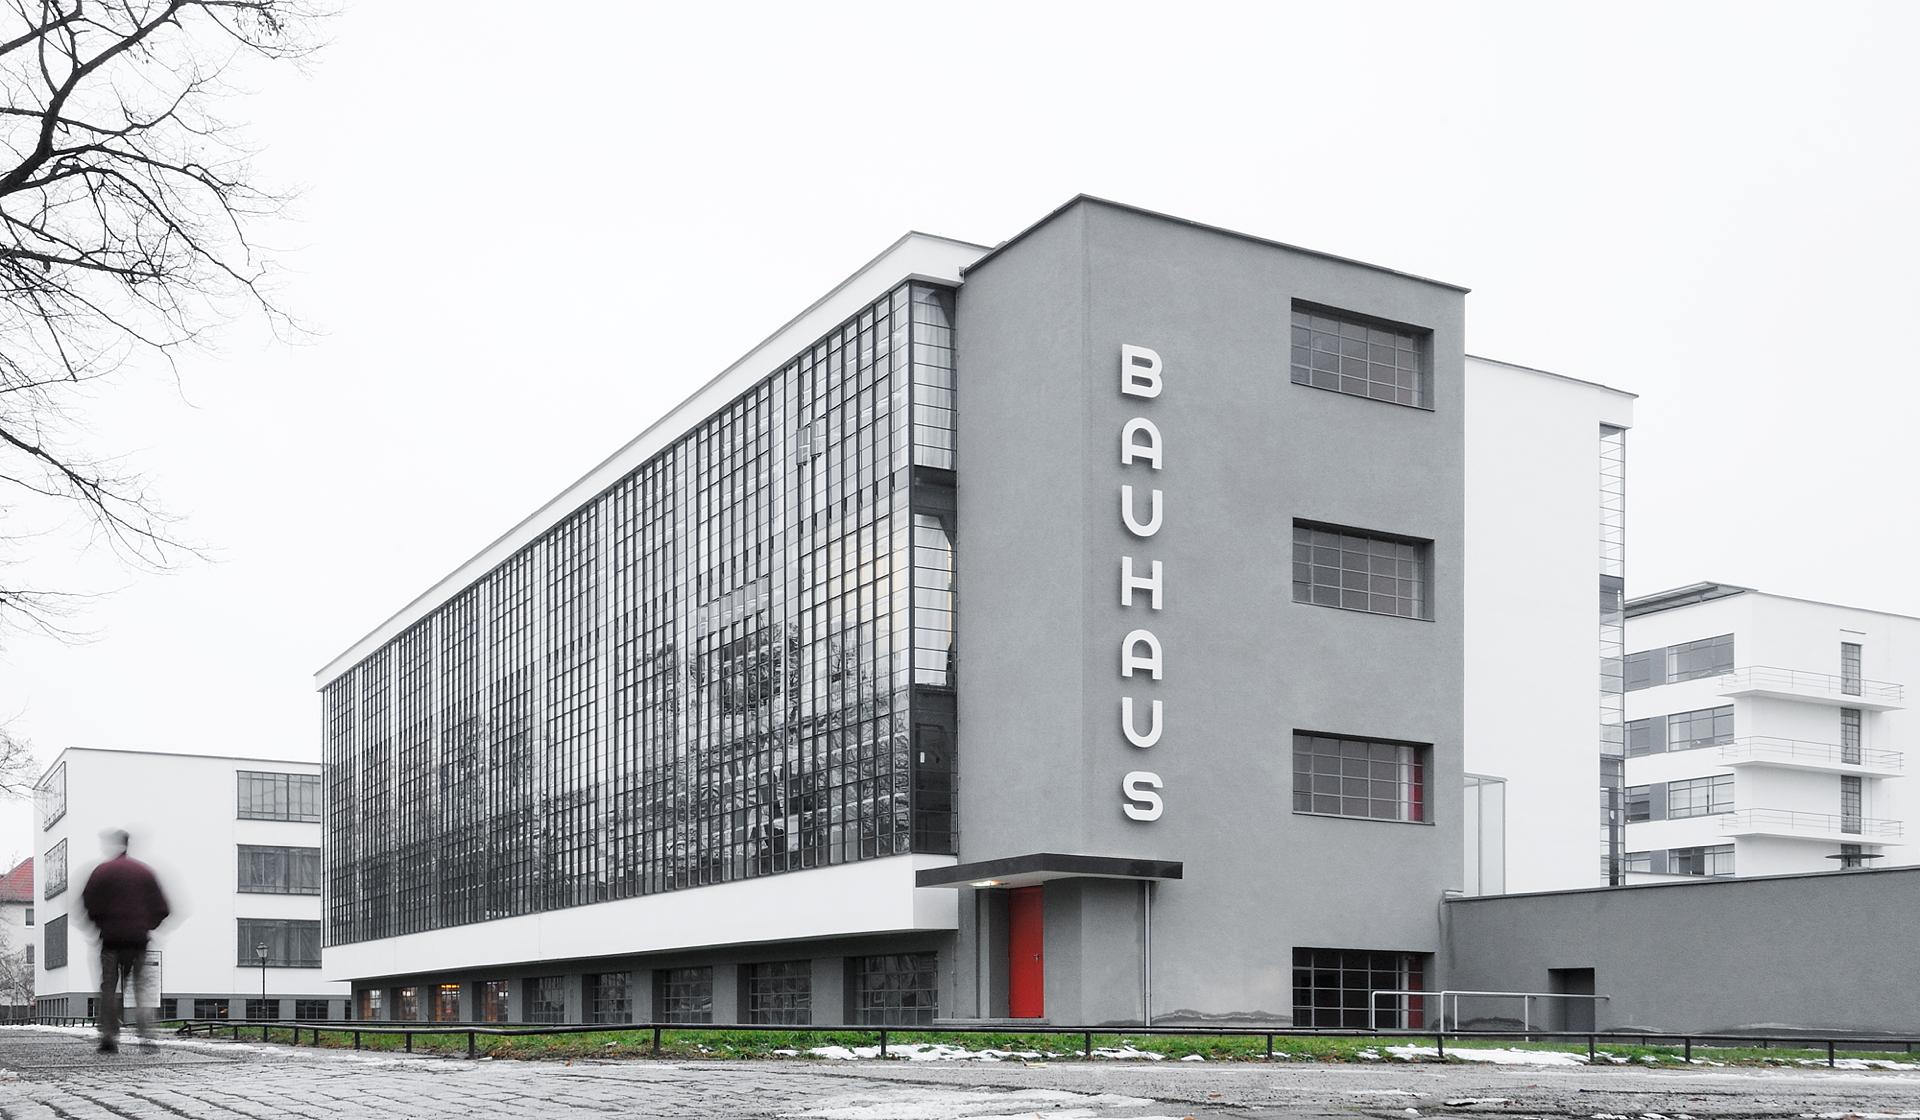 Bauhaus Dessau.